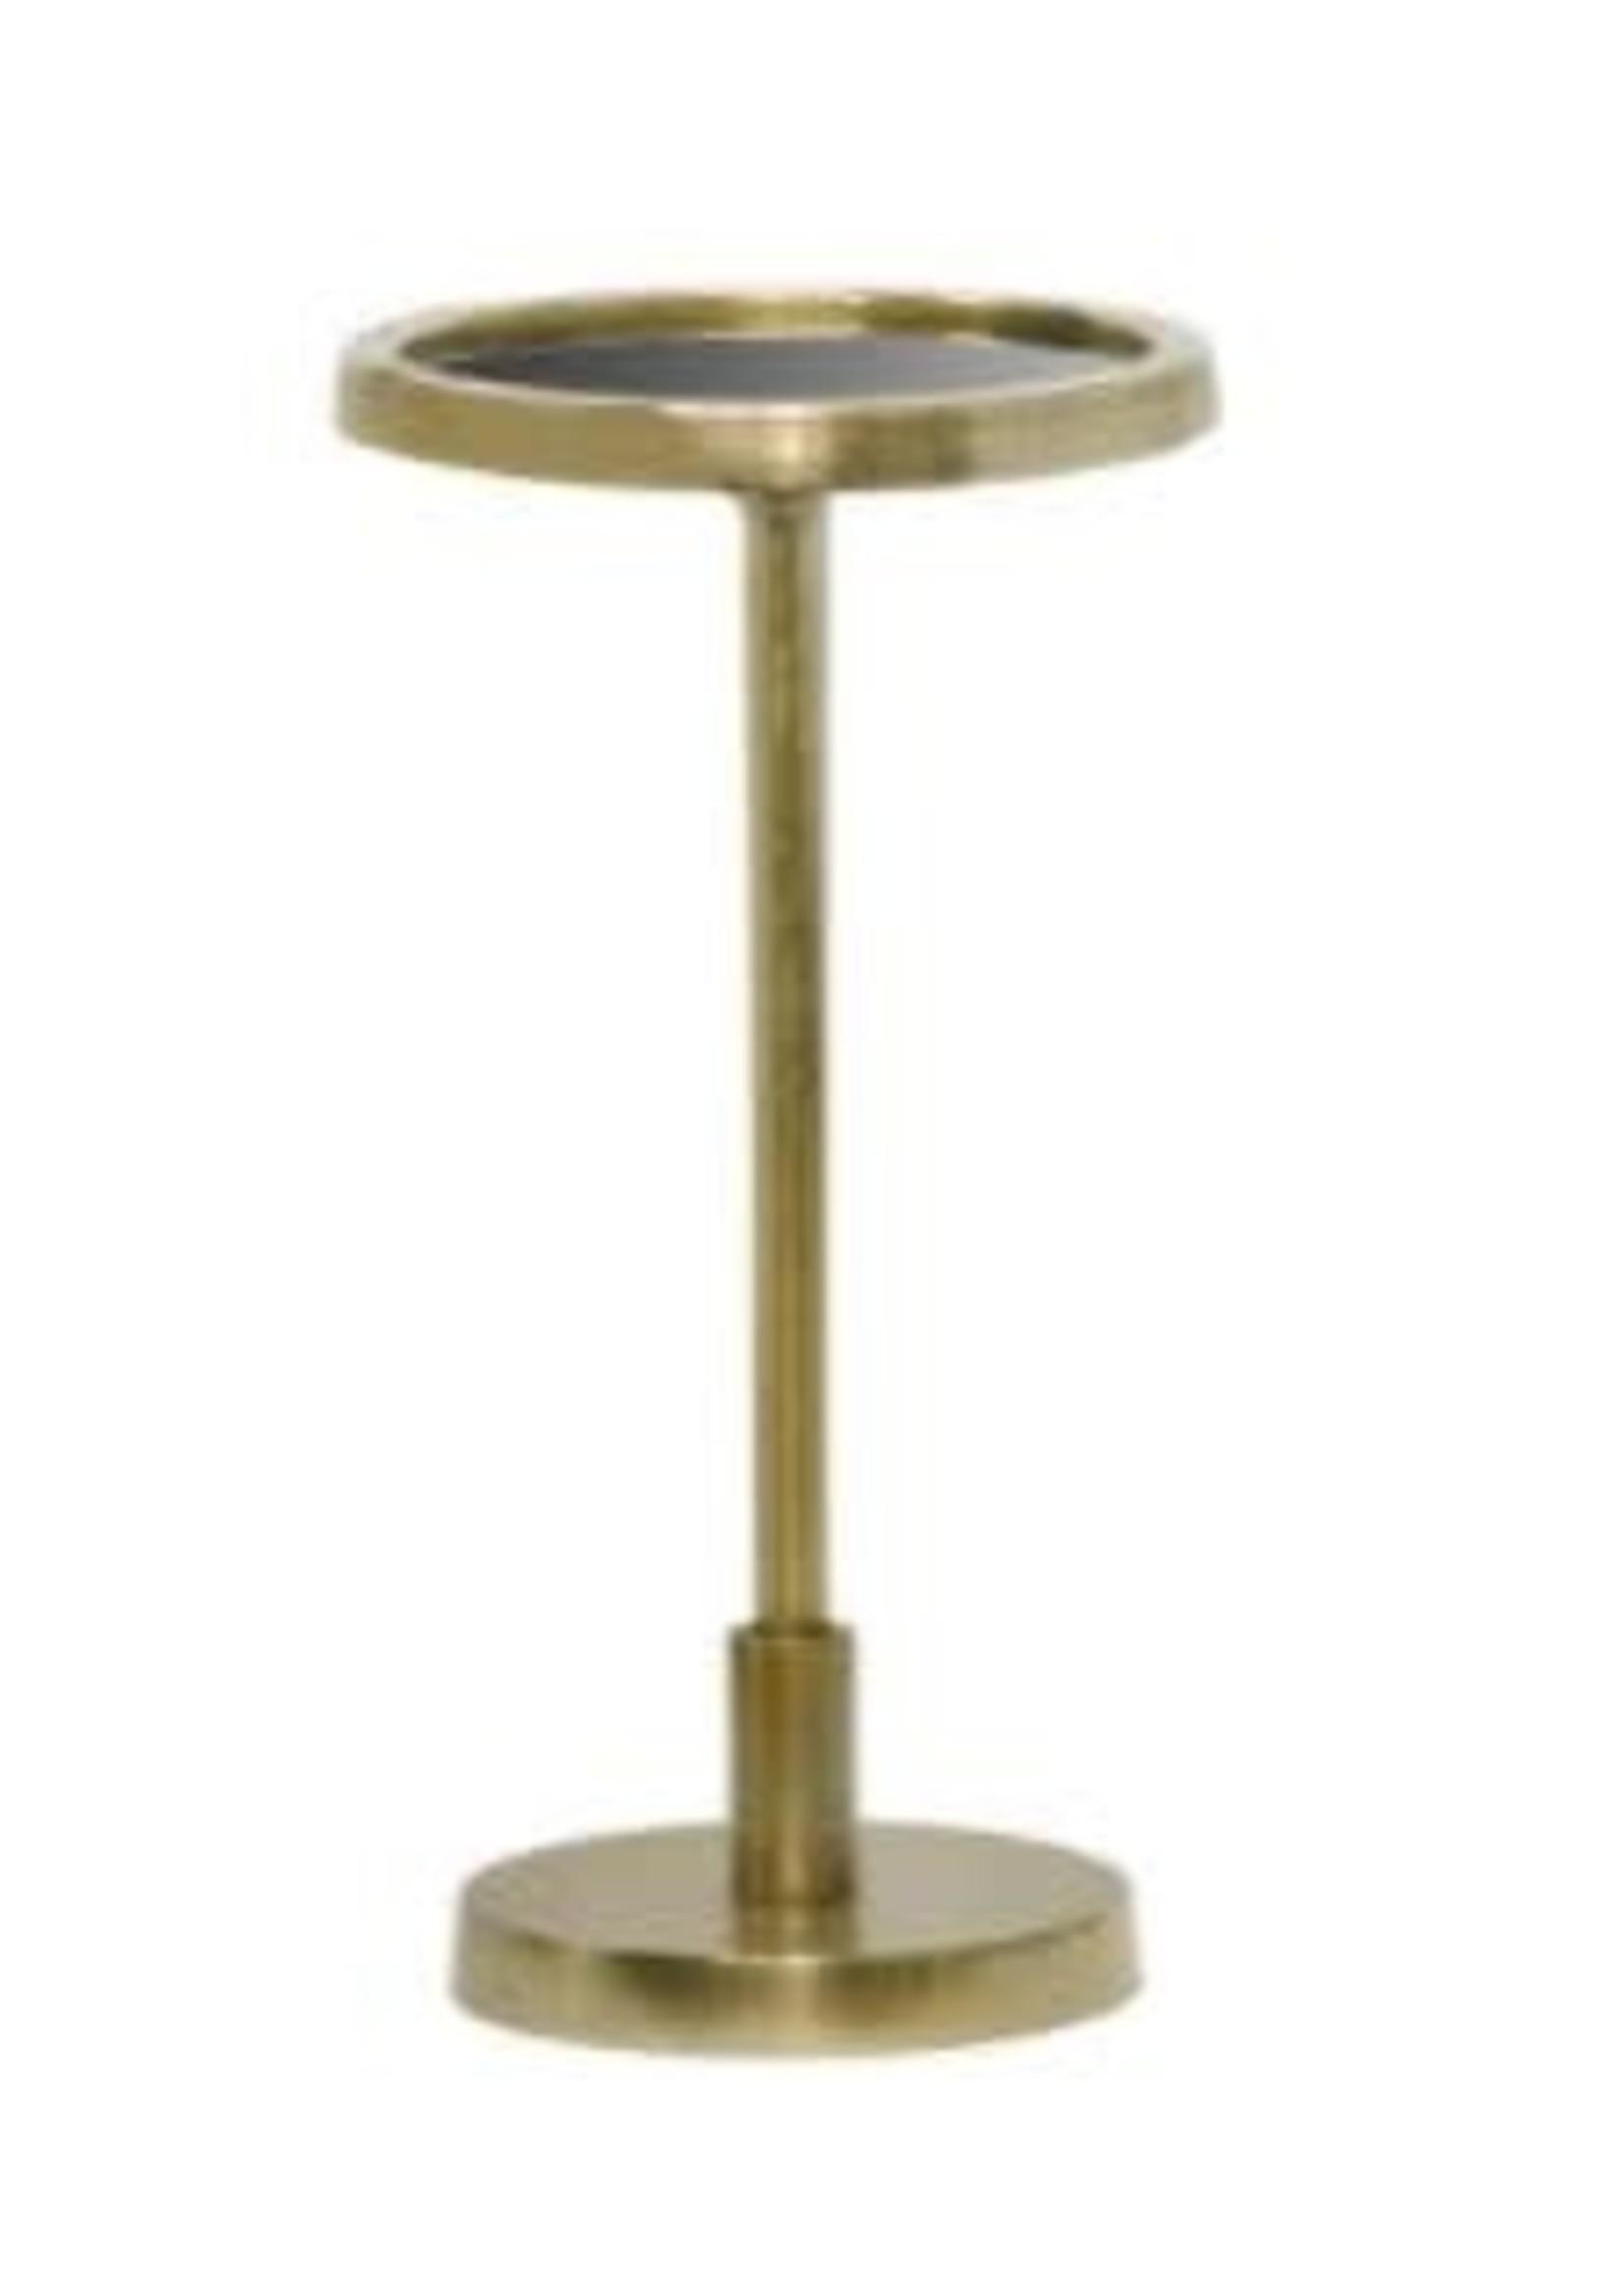 Moods Collection Ronde tafel antique goud&zwart glas 25x46